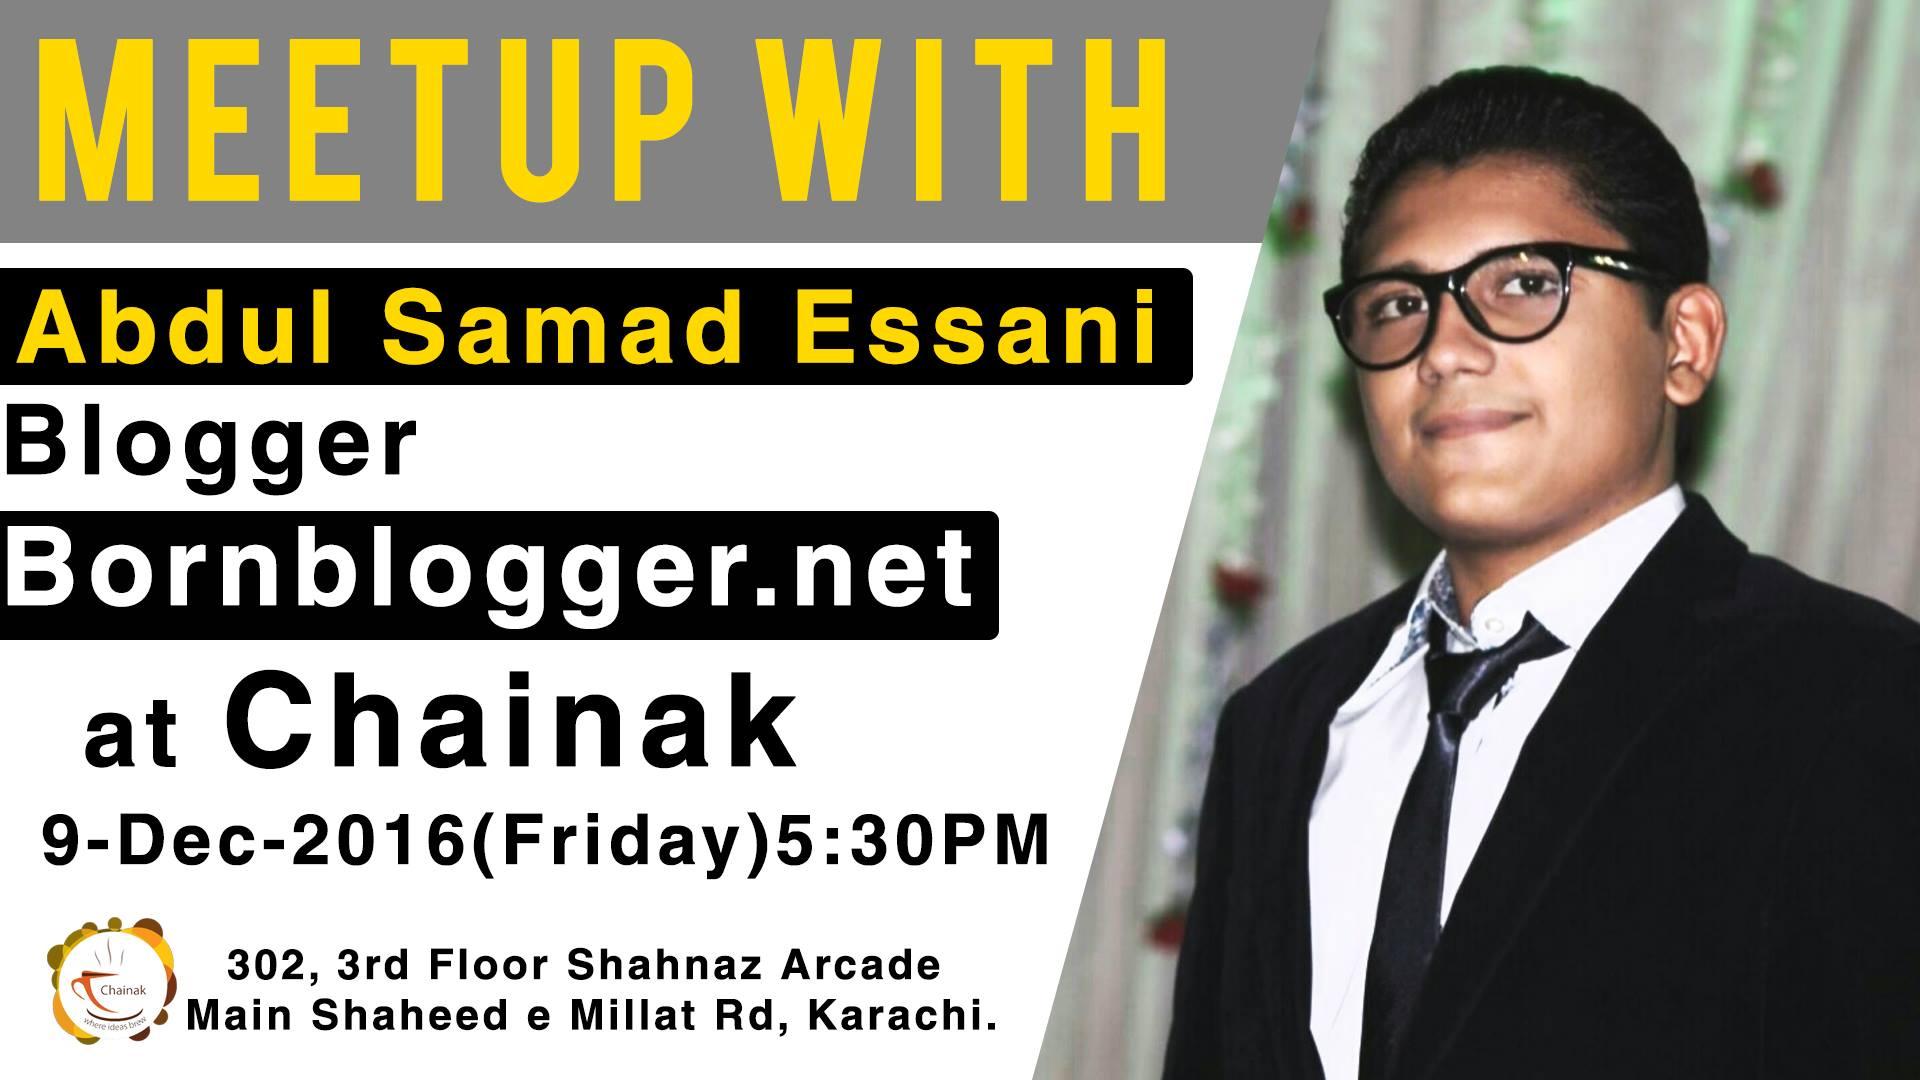 Meet Abdul Samad Essani Seminar.